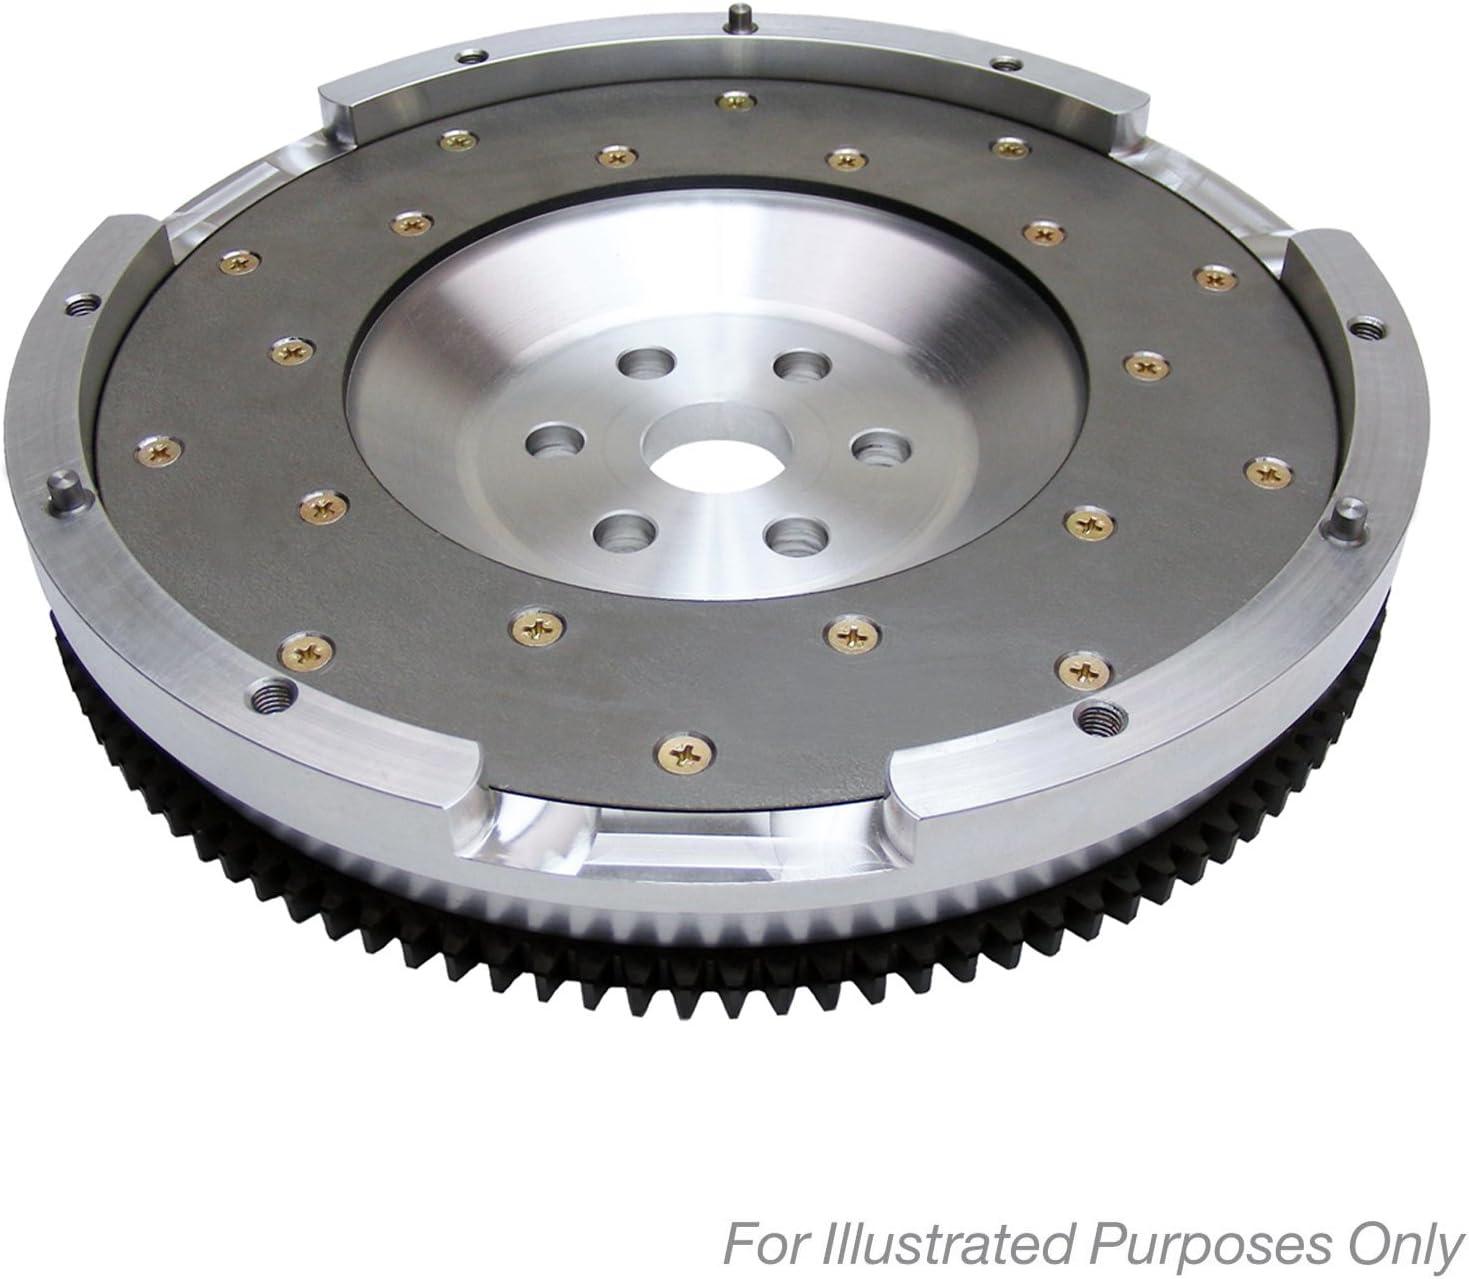 LuK 415 0161 10 Zms Volante Motor